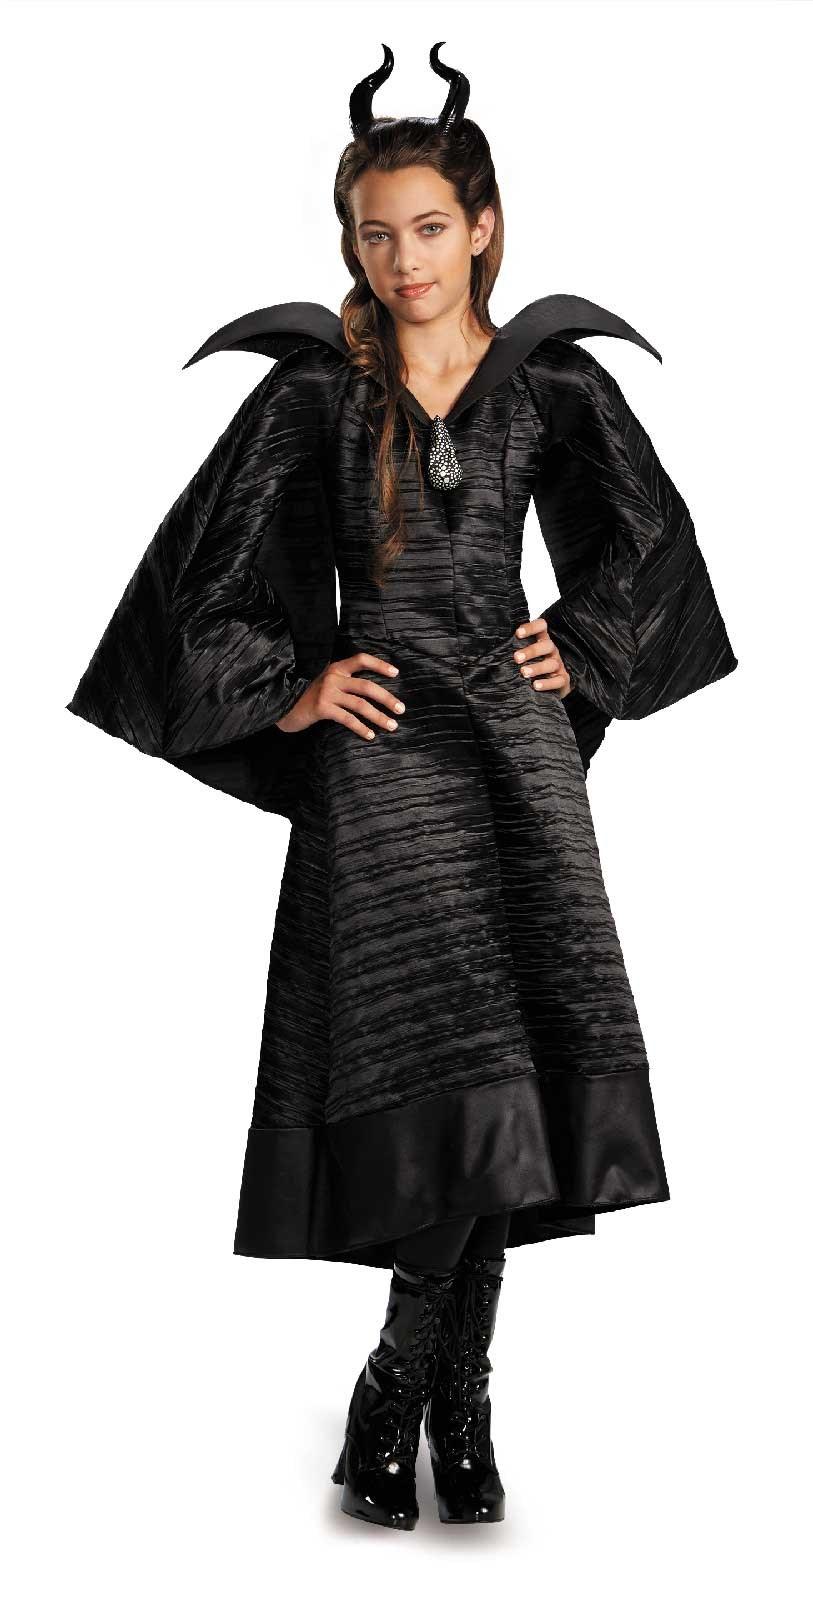 Image of Maleficent Deluxe Christening Black Dress Girls Costume